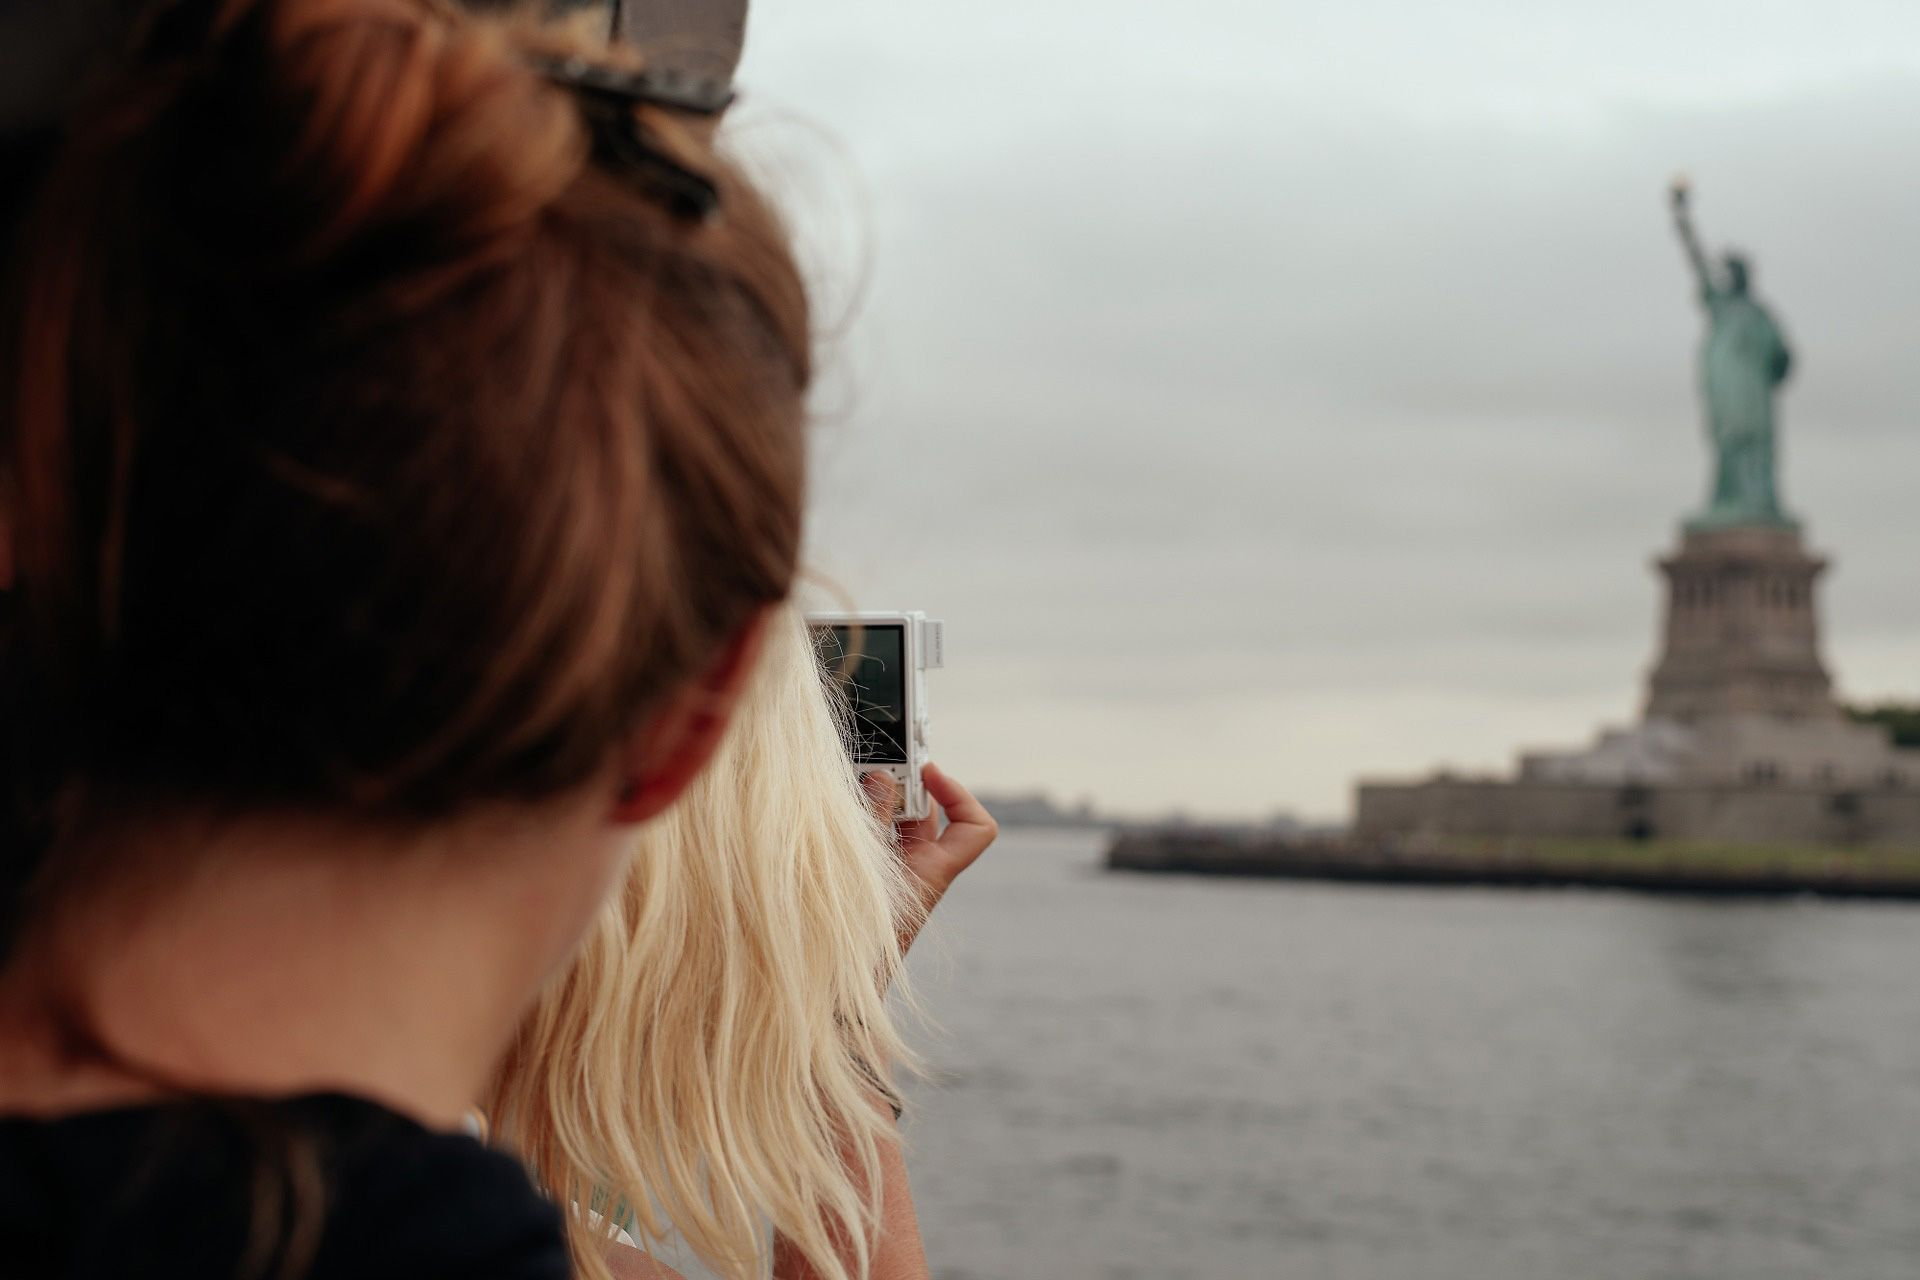 Tourists taking photo of Statue of Liberty